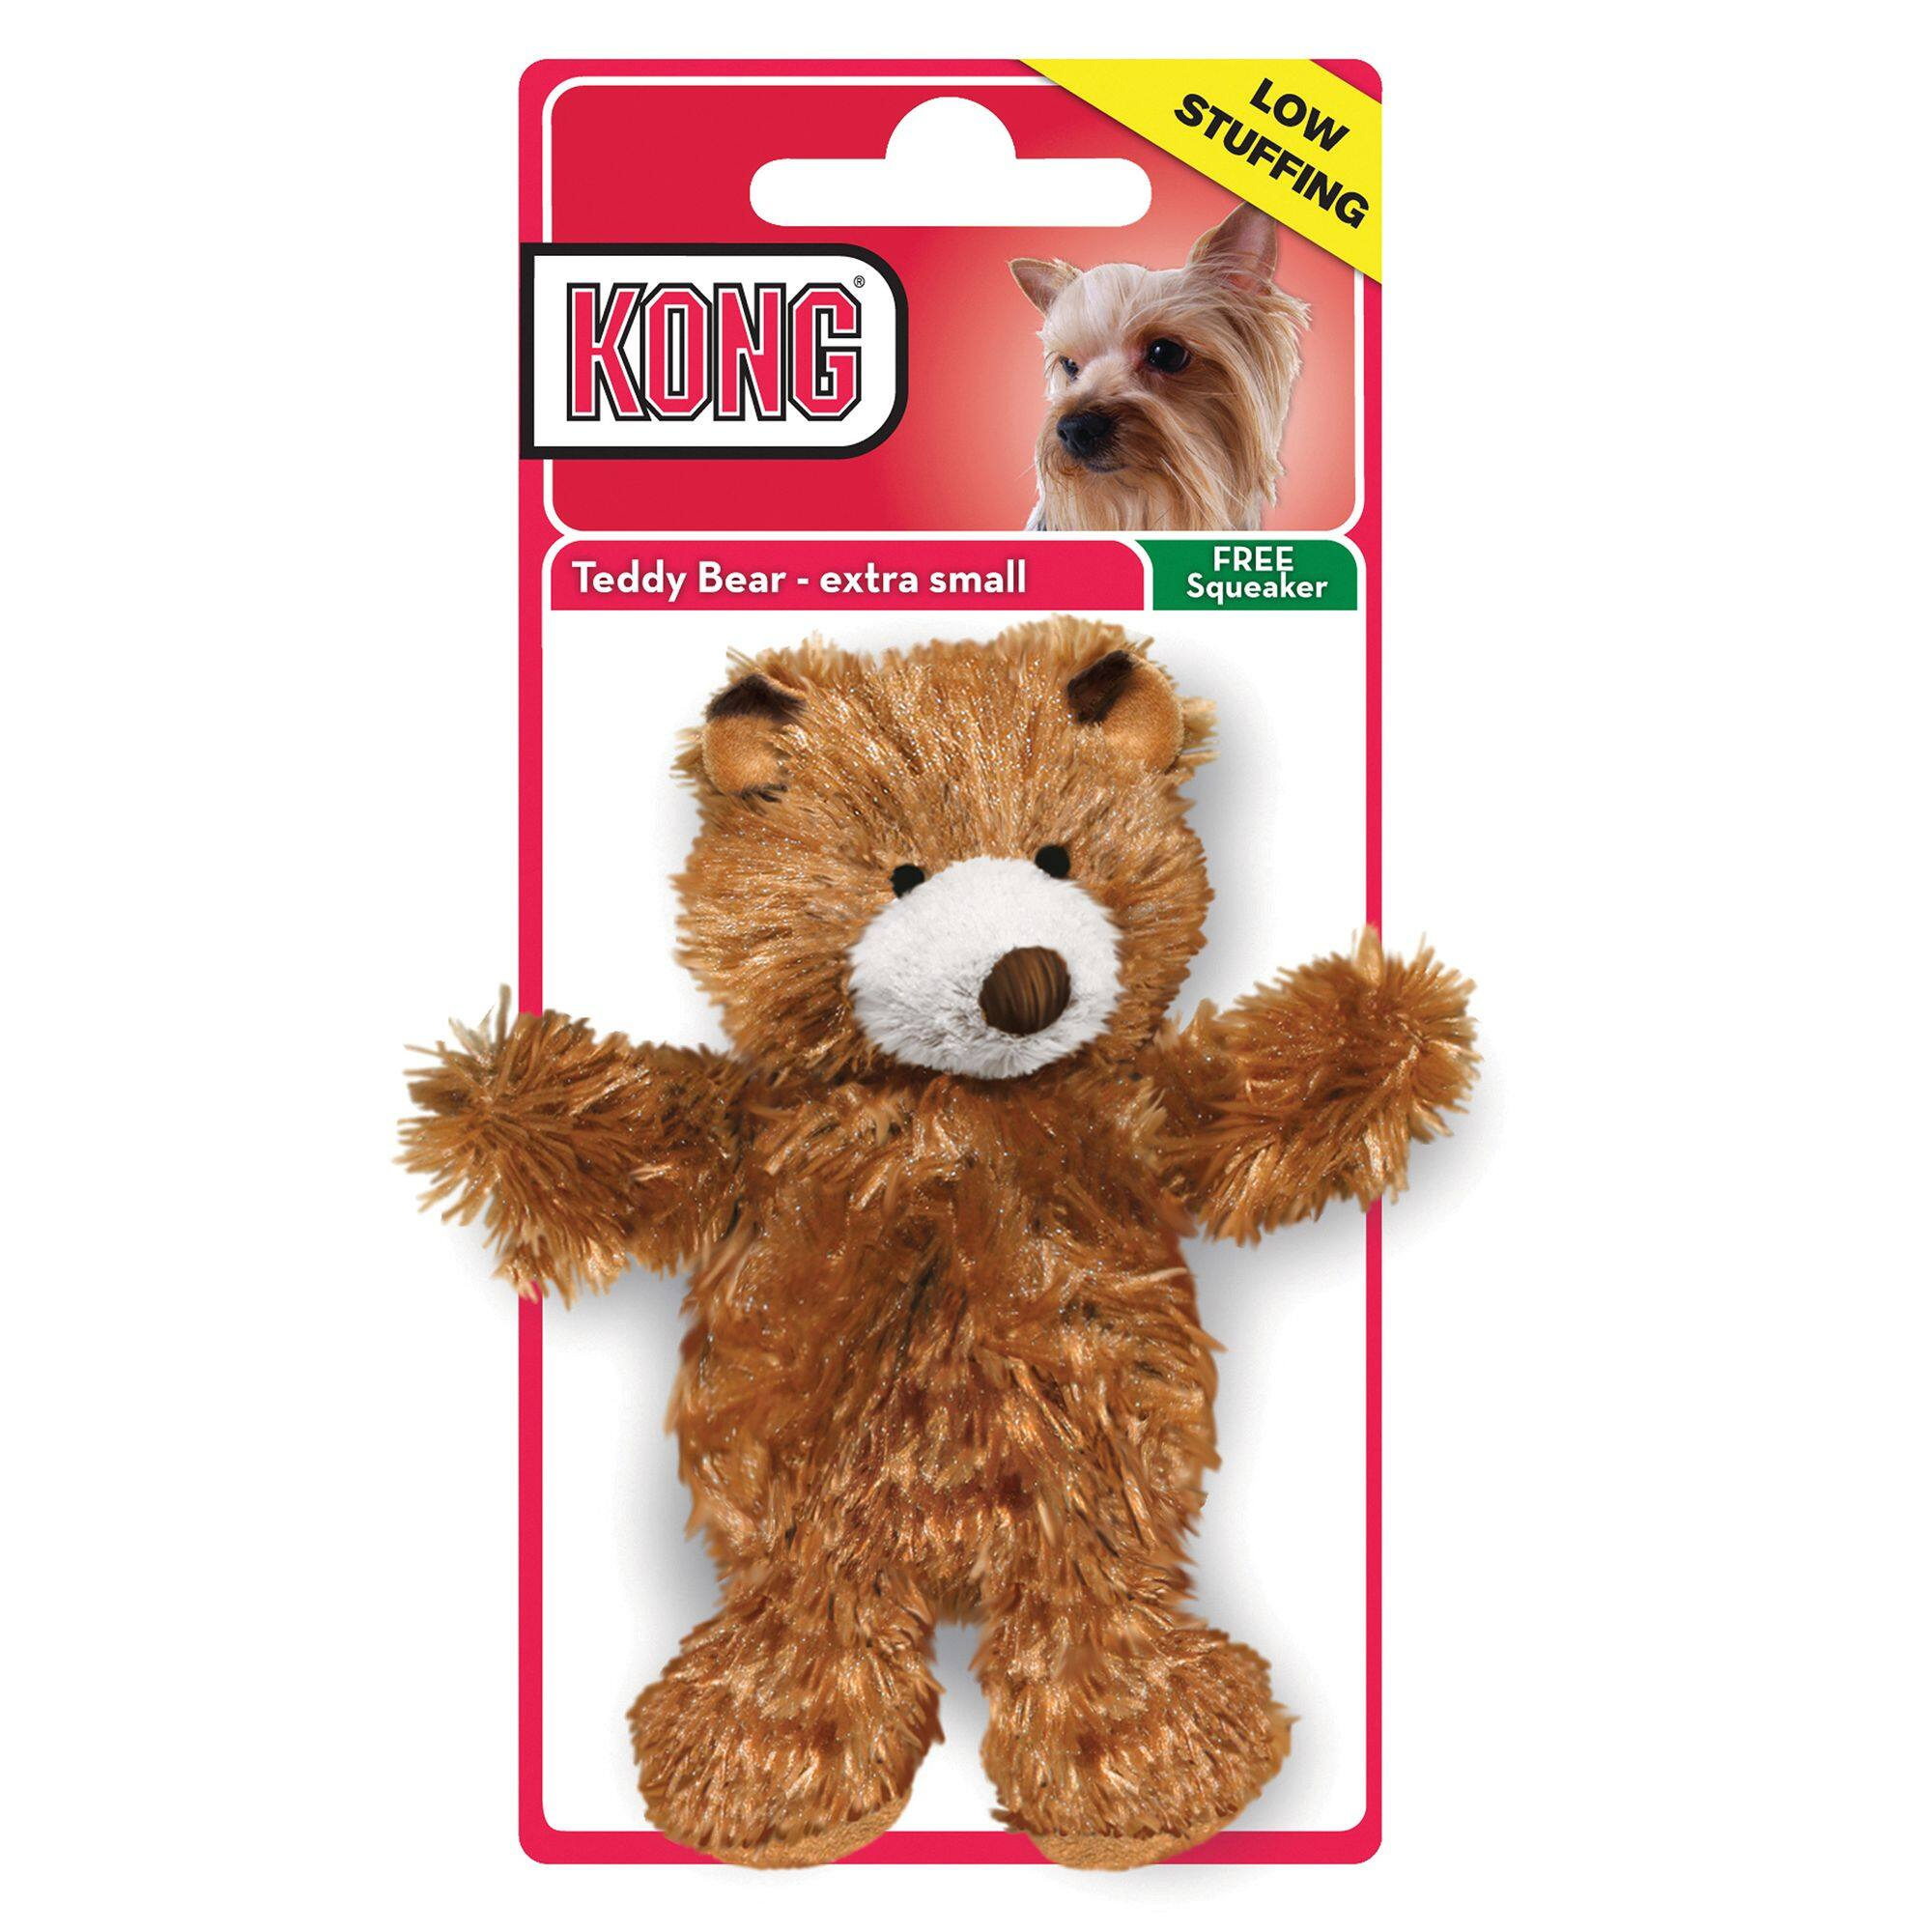 KONG Teddy Bear Dog Toy (Extra Small)